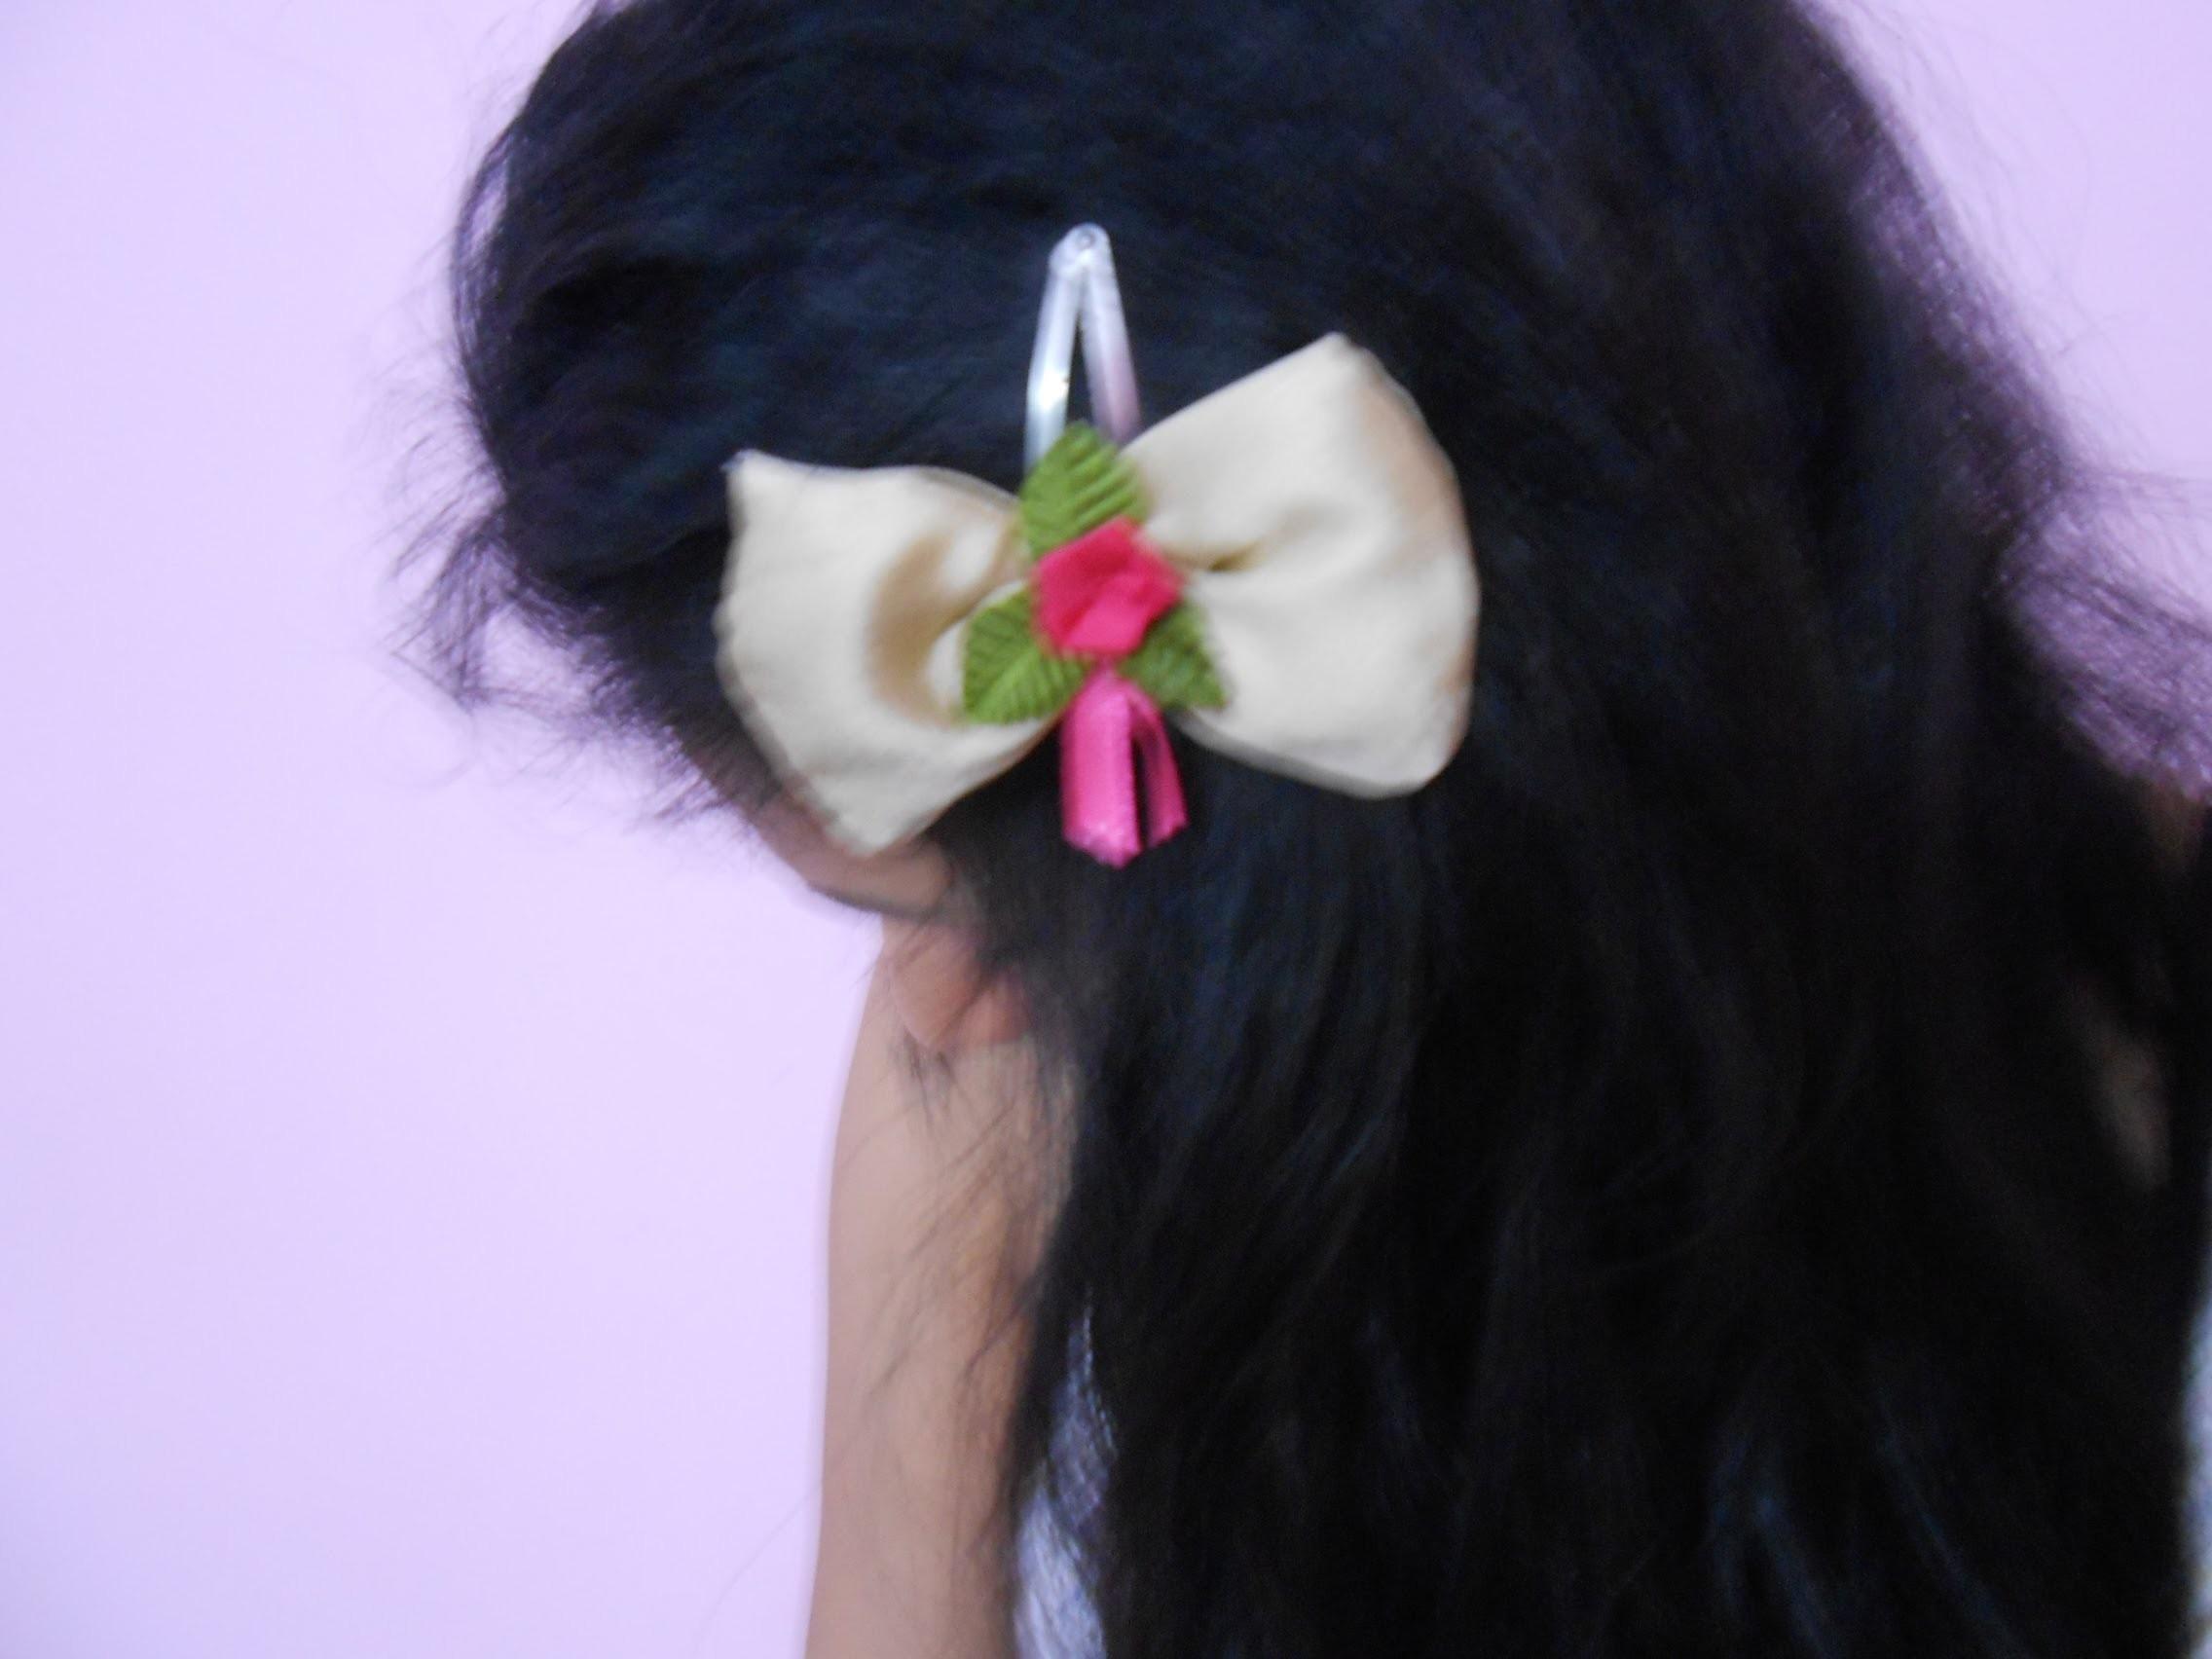 How To Make Flower Hair Clip At Home-DIY Bow Hair Floral Clip. Tutorial